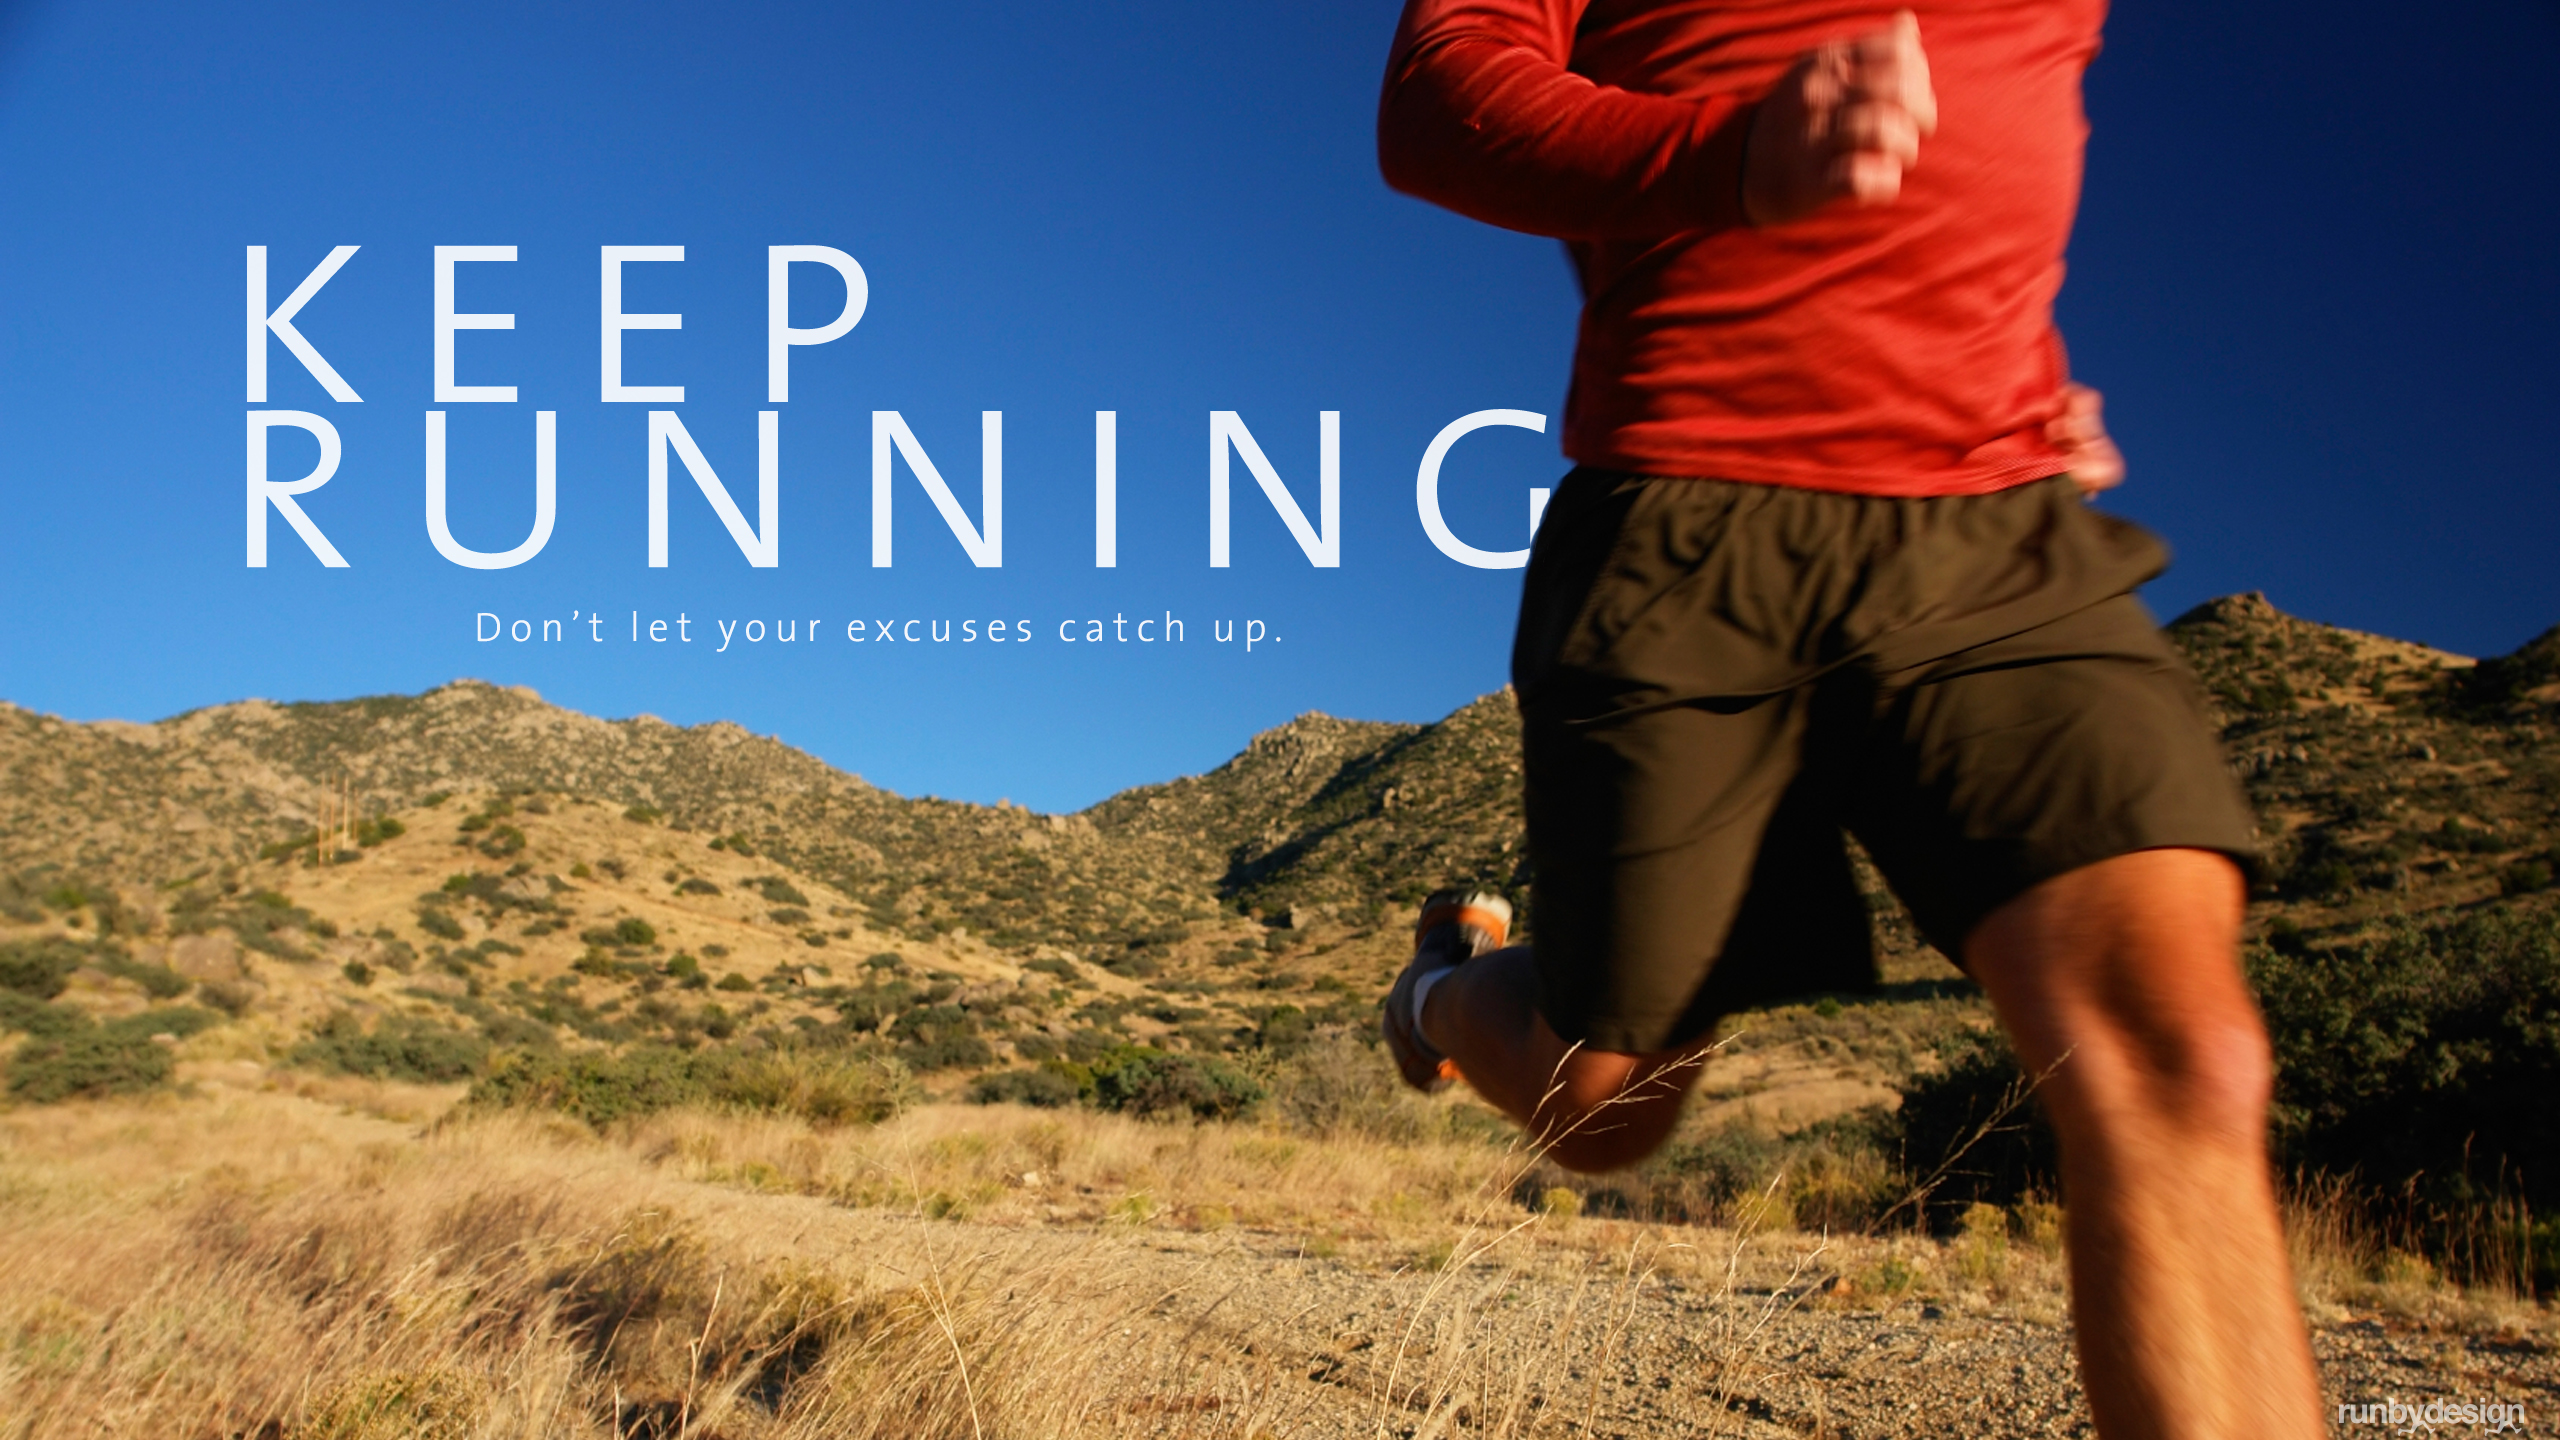 21 Inspiring Fitness Motivation Wallpaper To Keep You Going Best 2560x1440